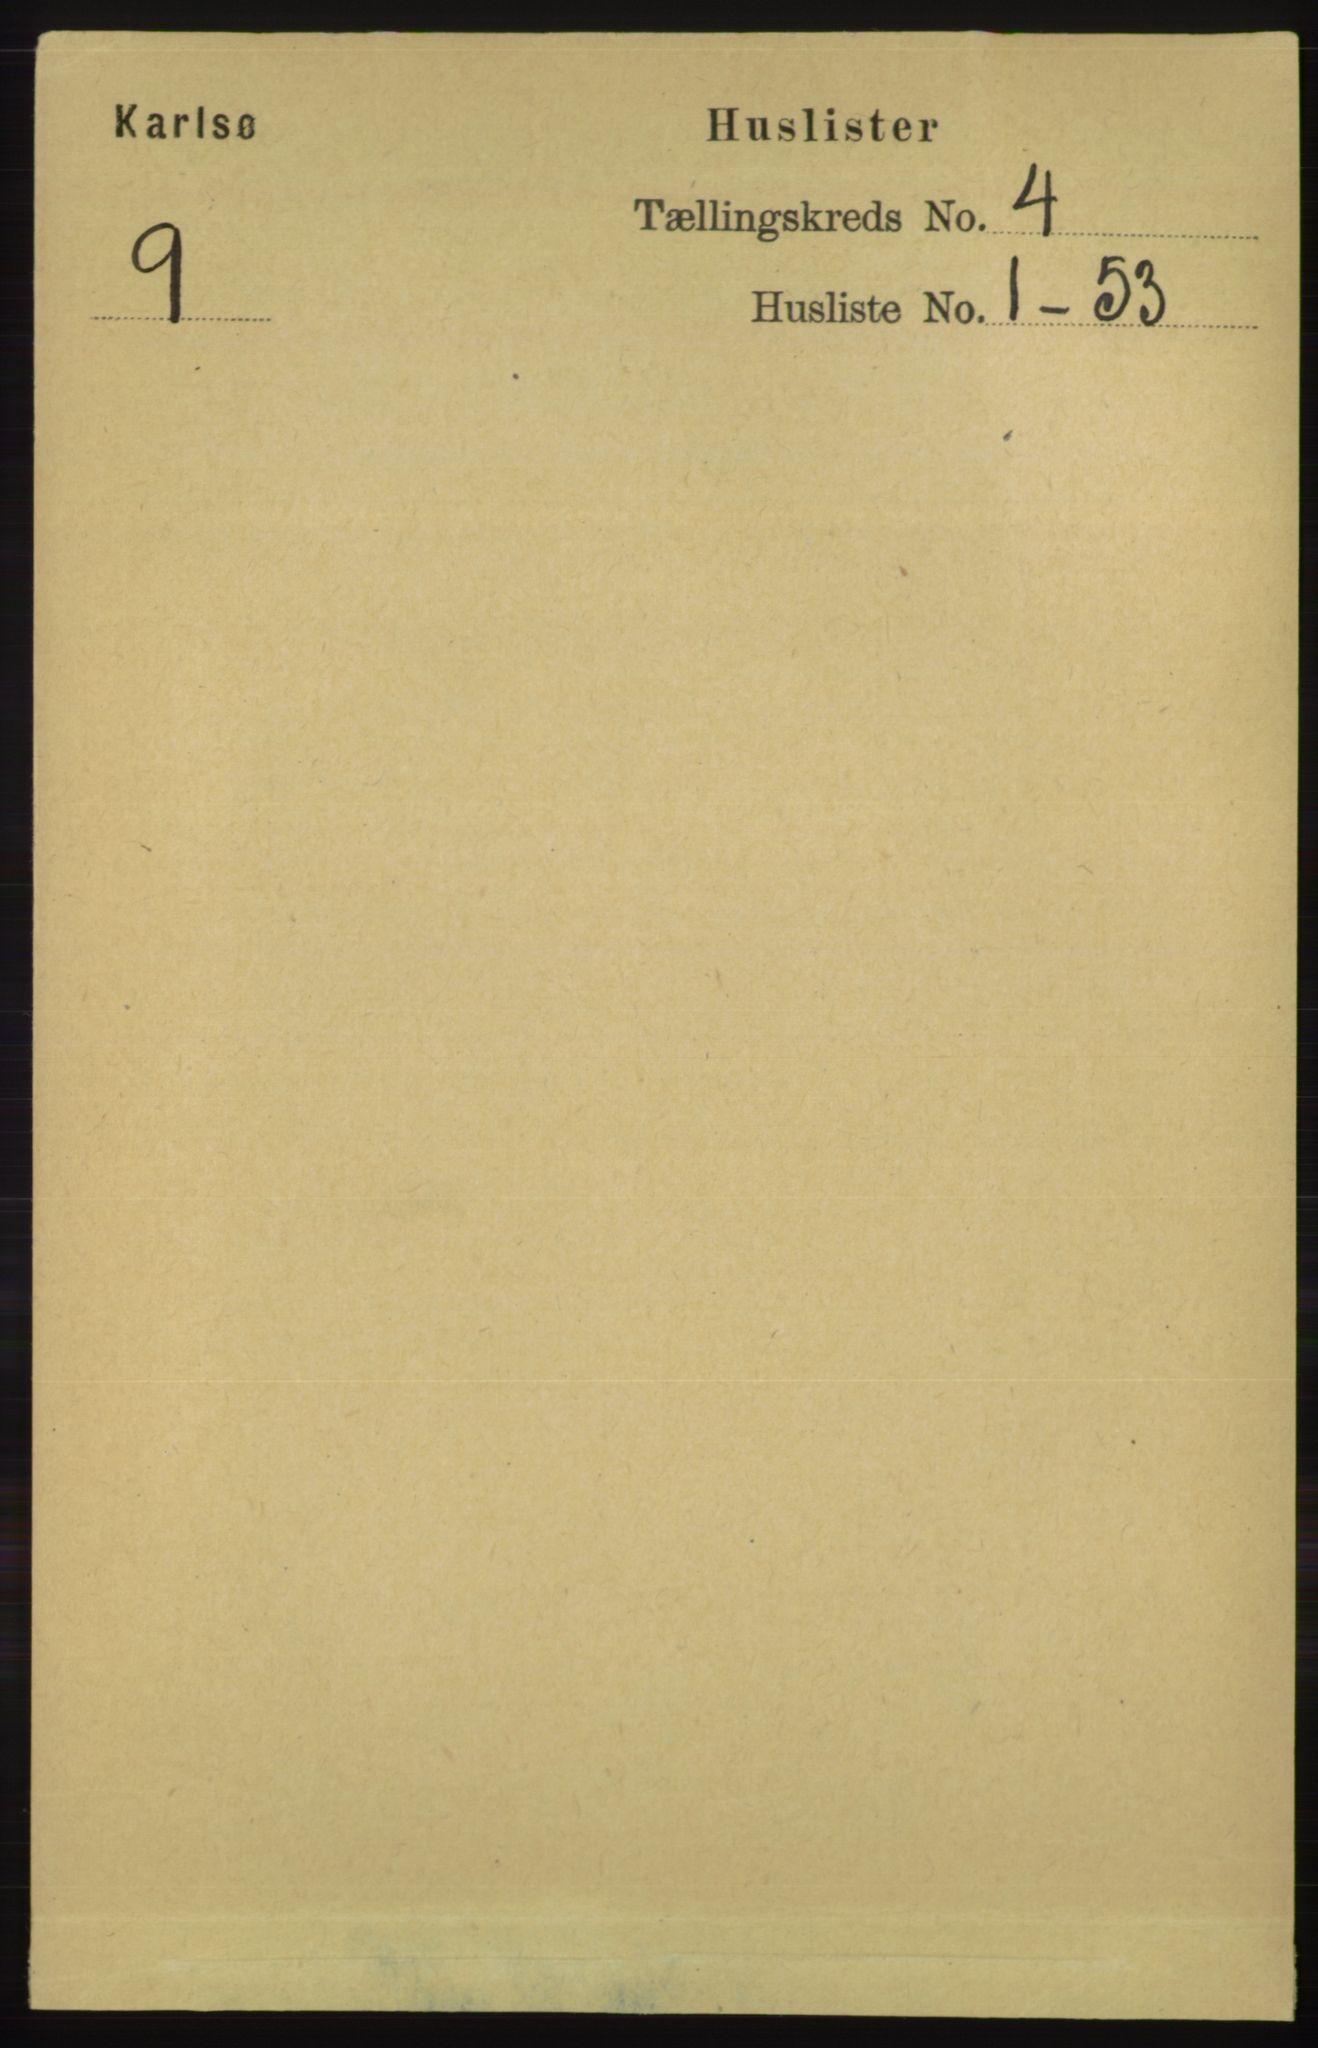 RA, Folketelling 1891 for 1936 Karlsøy herred, 1891, s. 772